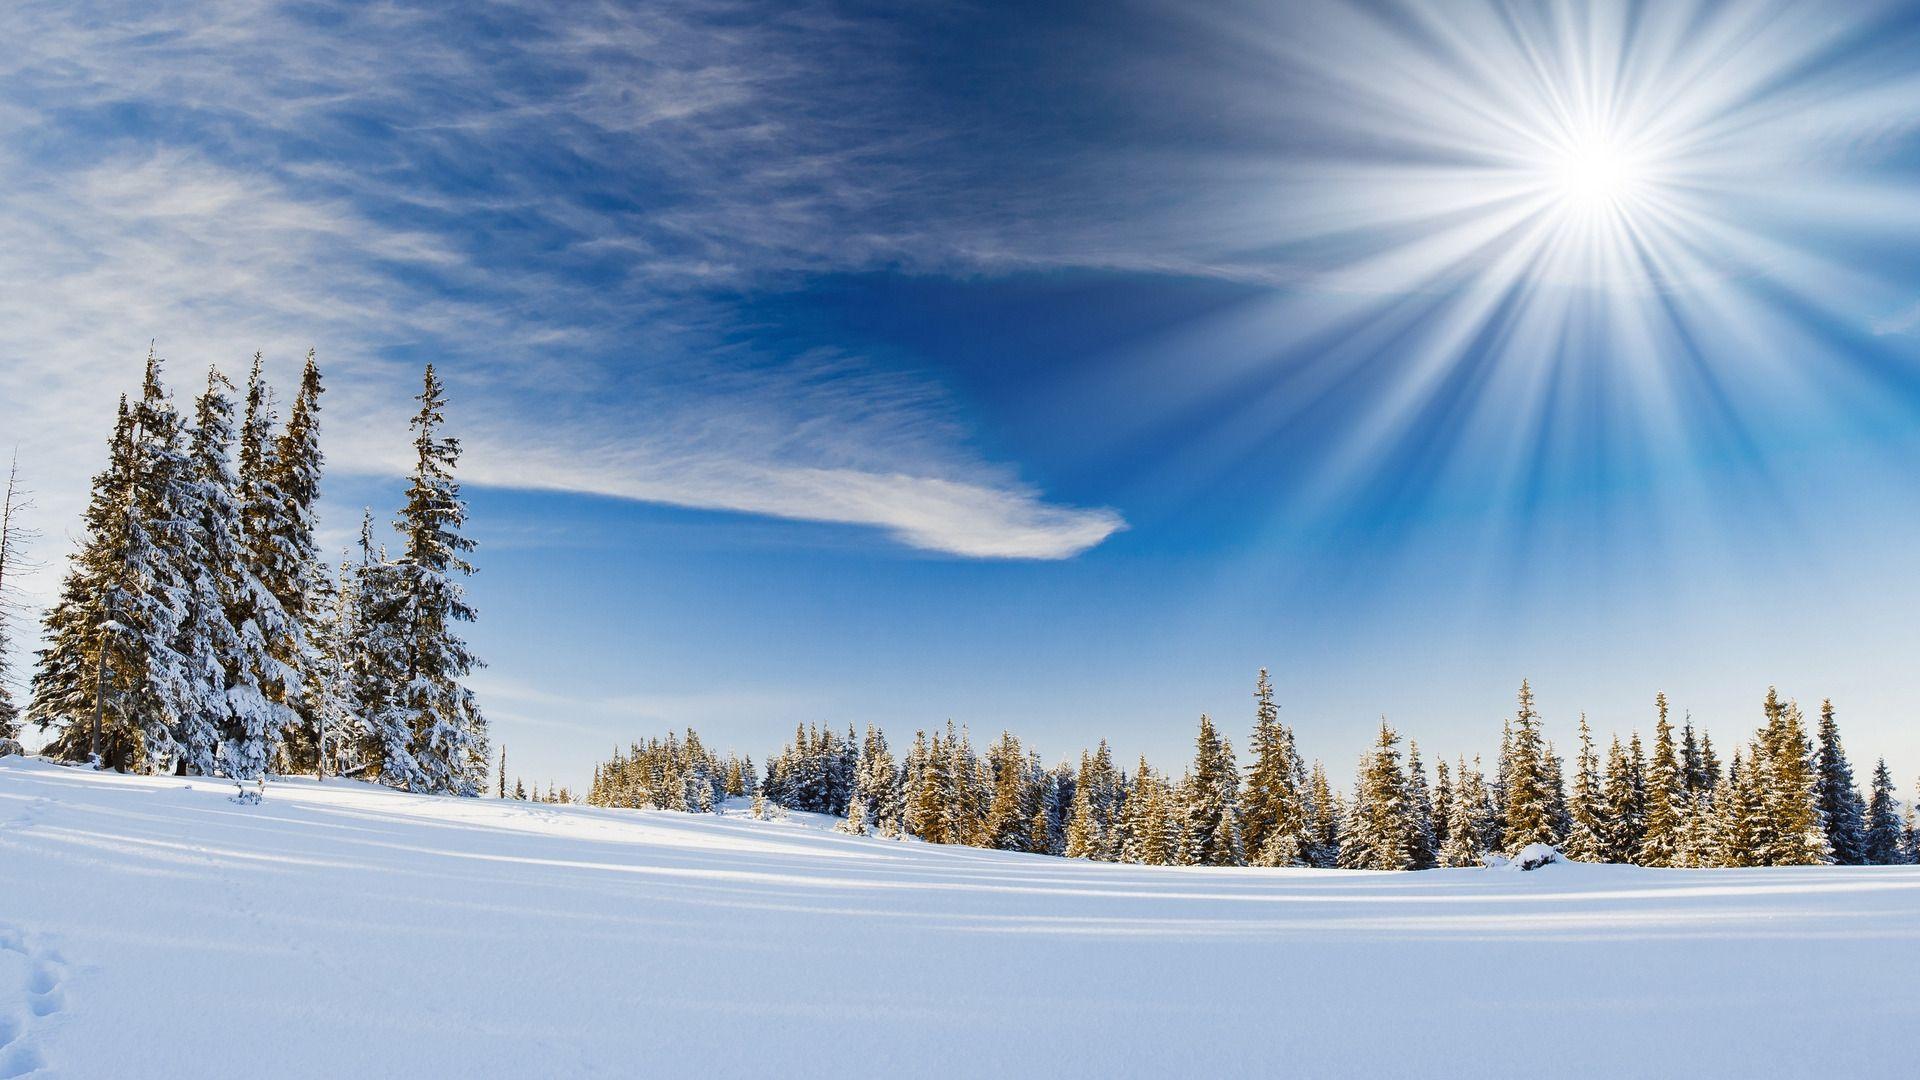 Winter Scene download wallpaper image